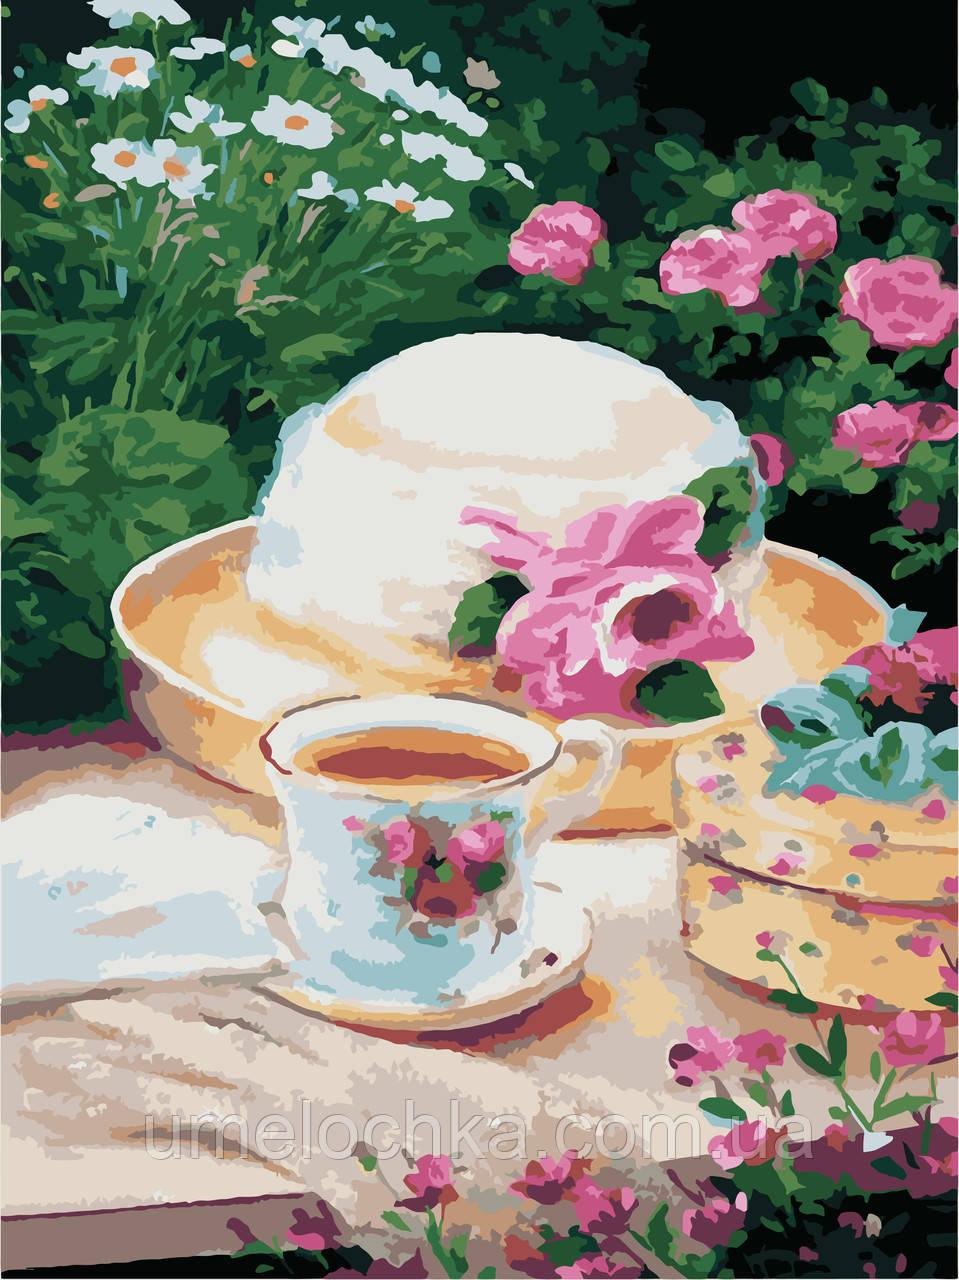 Раскраска по номерам без коробки Идейка Пикник в саду (KHO2206) 30 х 40 см